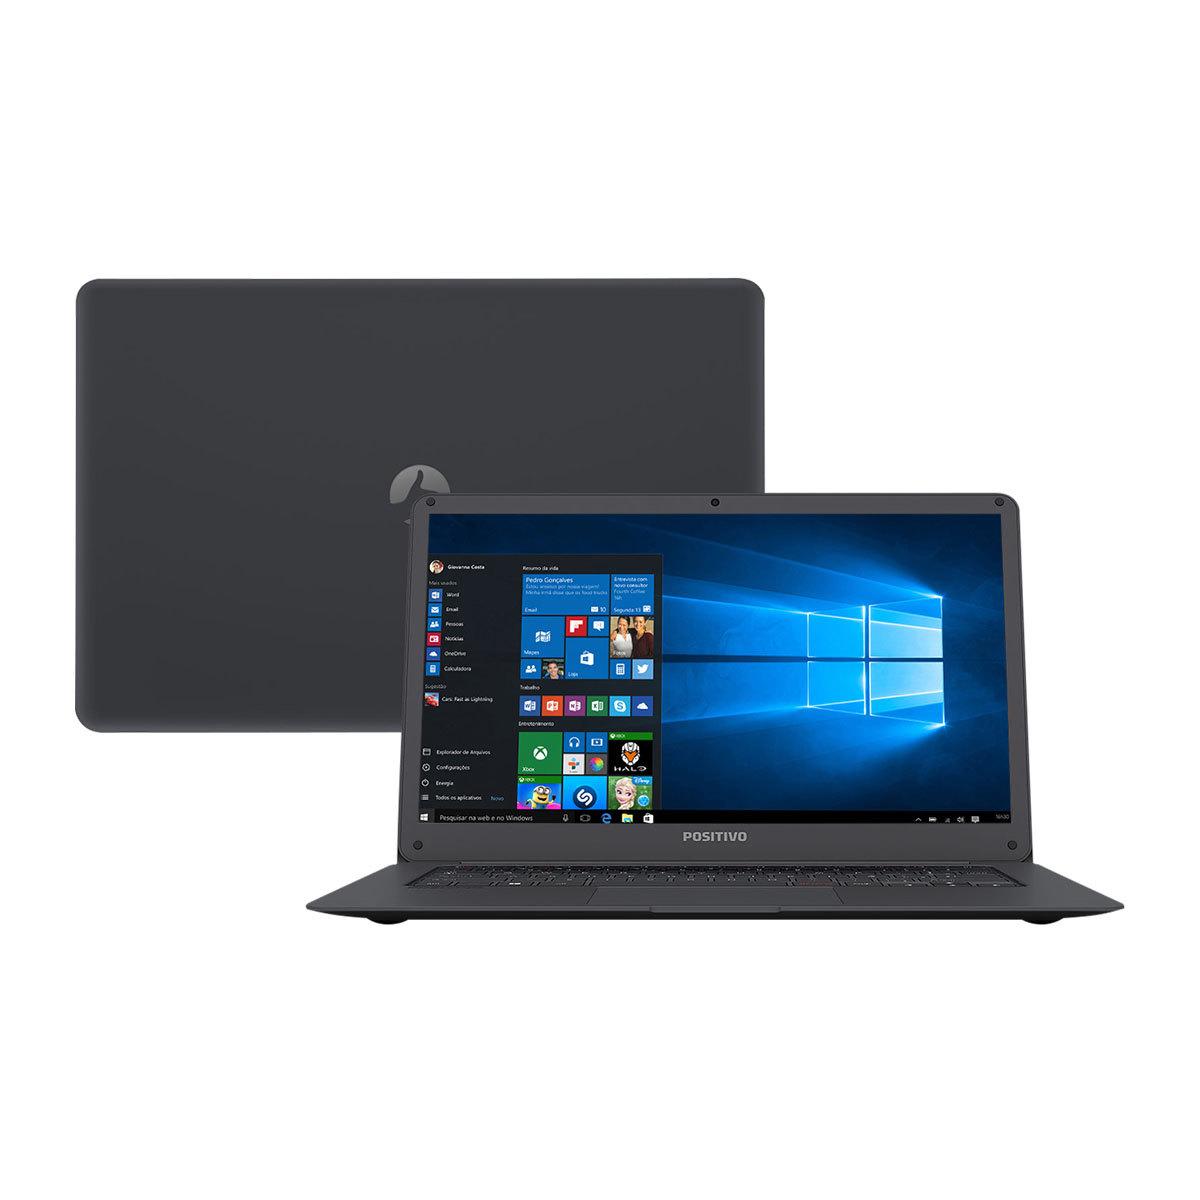 "notebook positivo - Notebook Positivo Intel Atom 14"" - R$ 869,00"